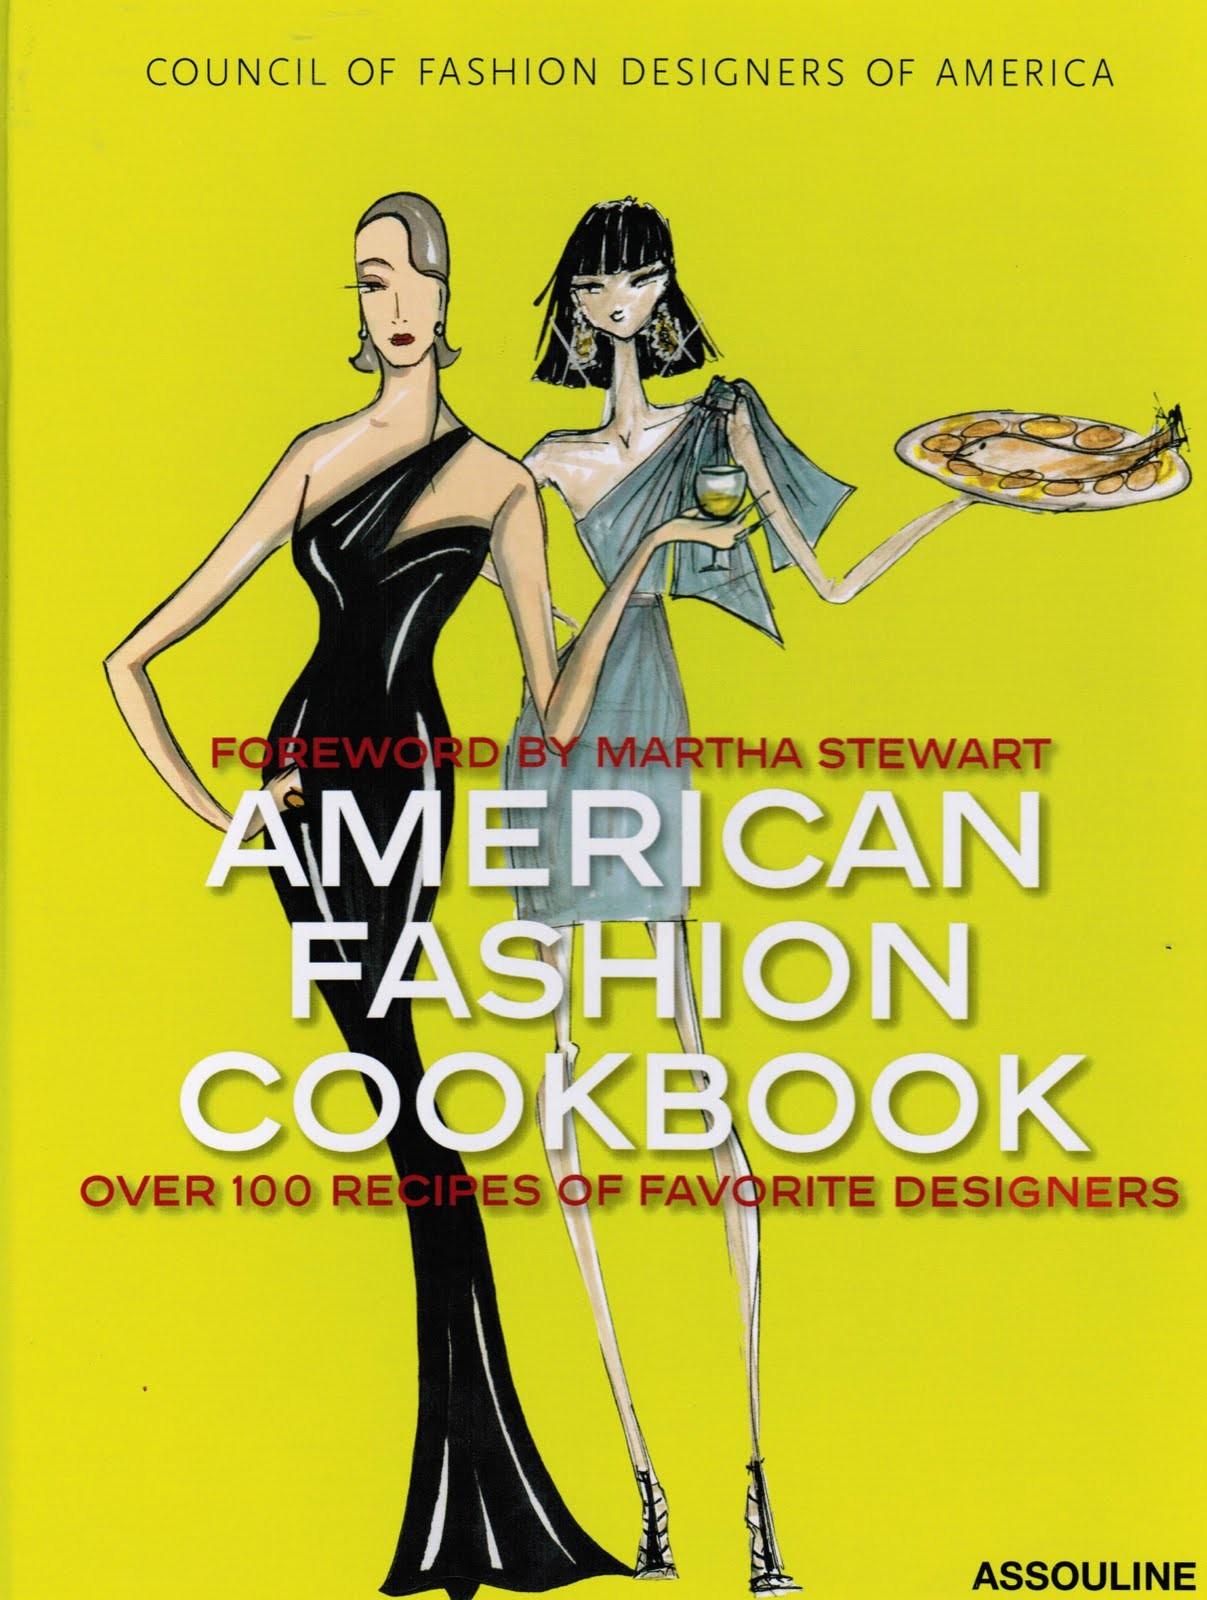 American Fashion Cookbook (4)